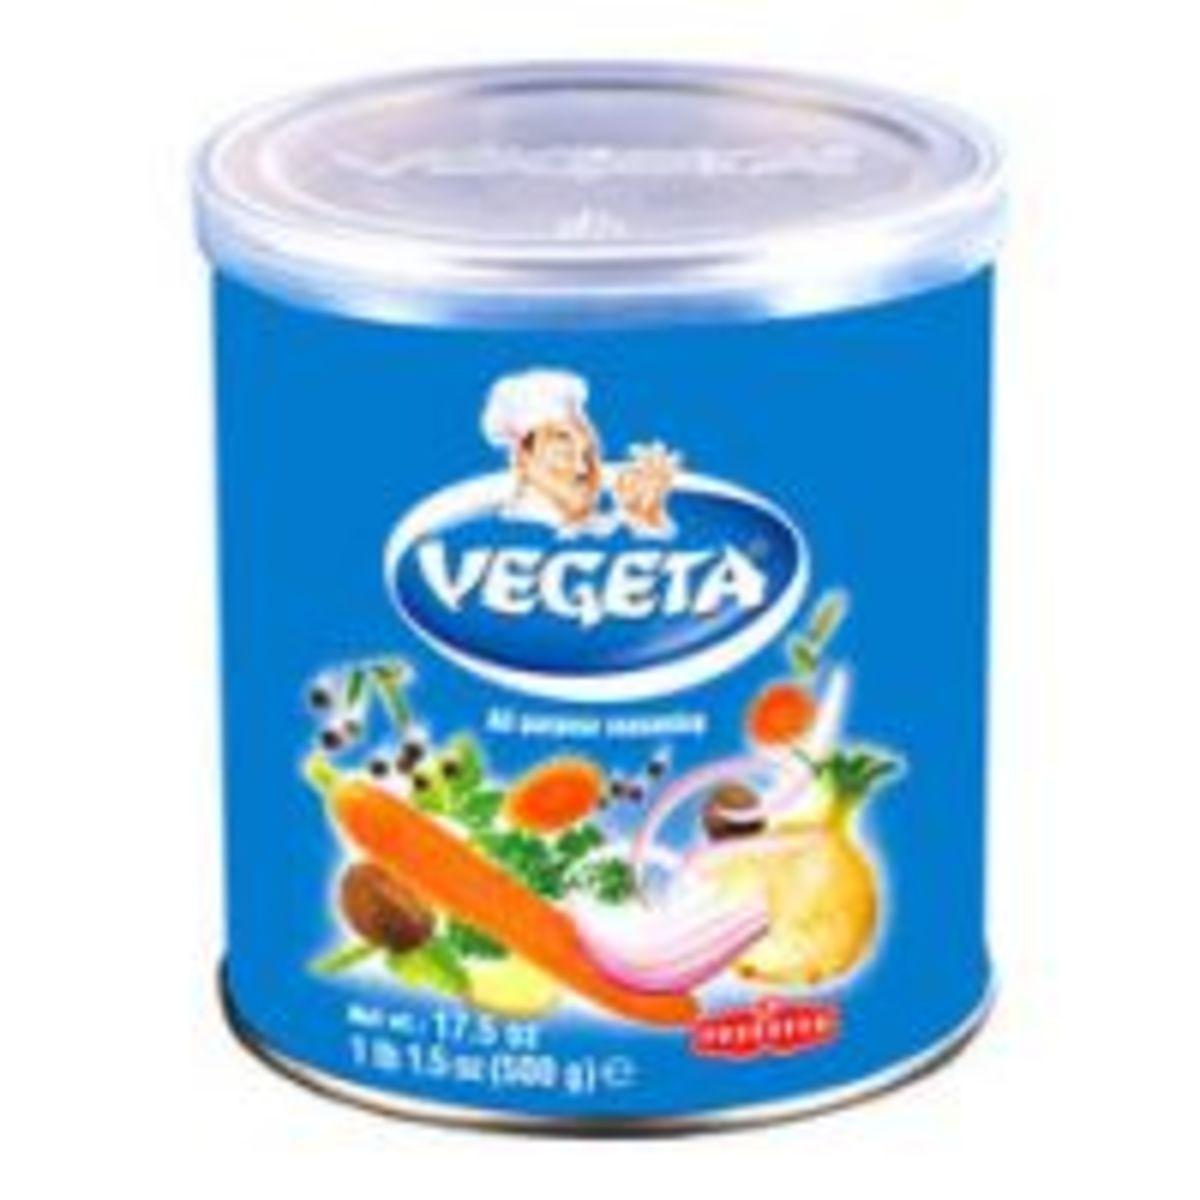 Vegeta seasoning